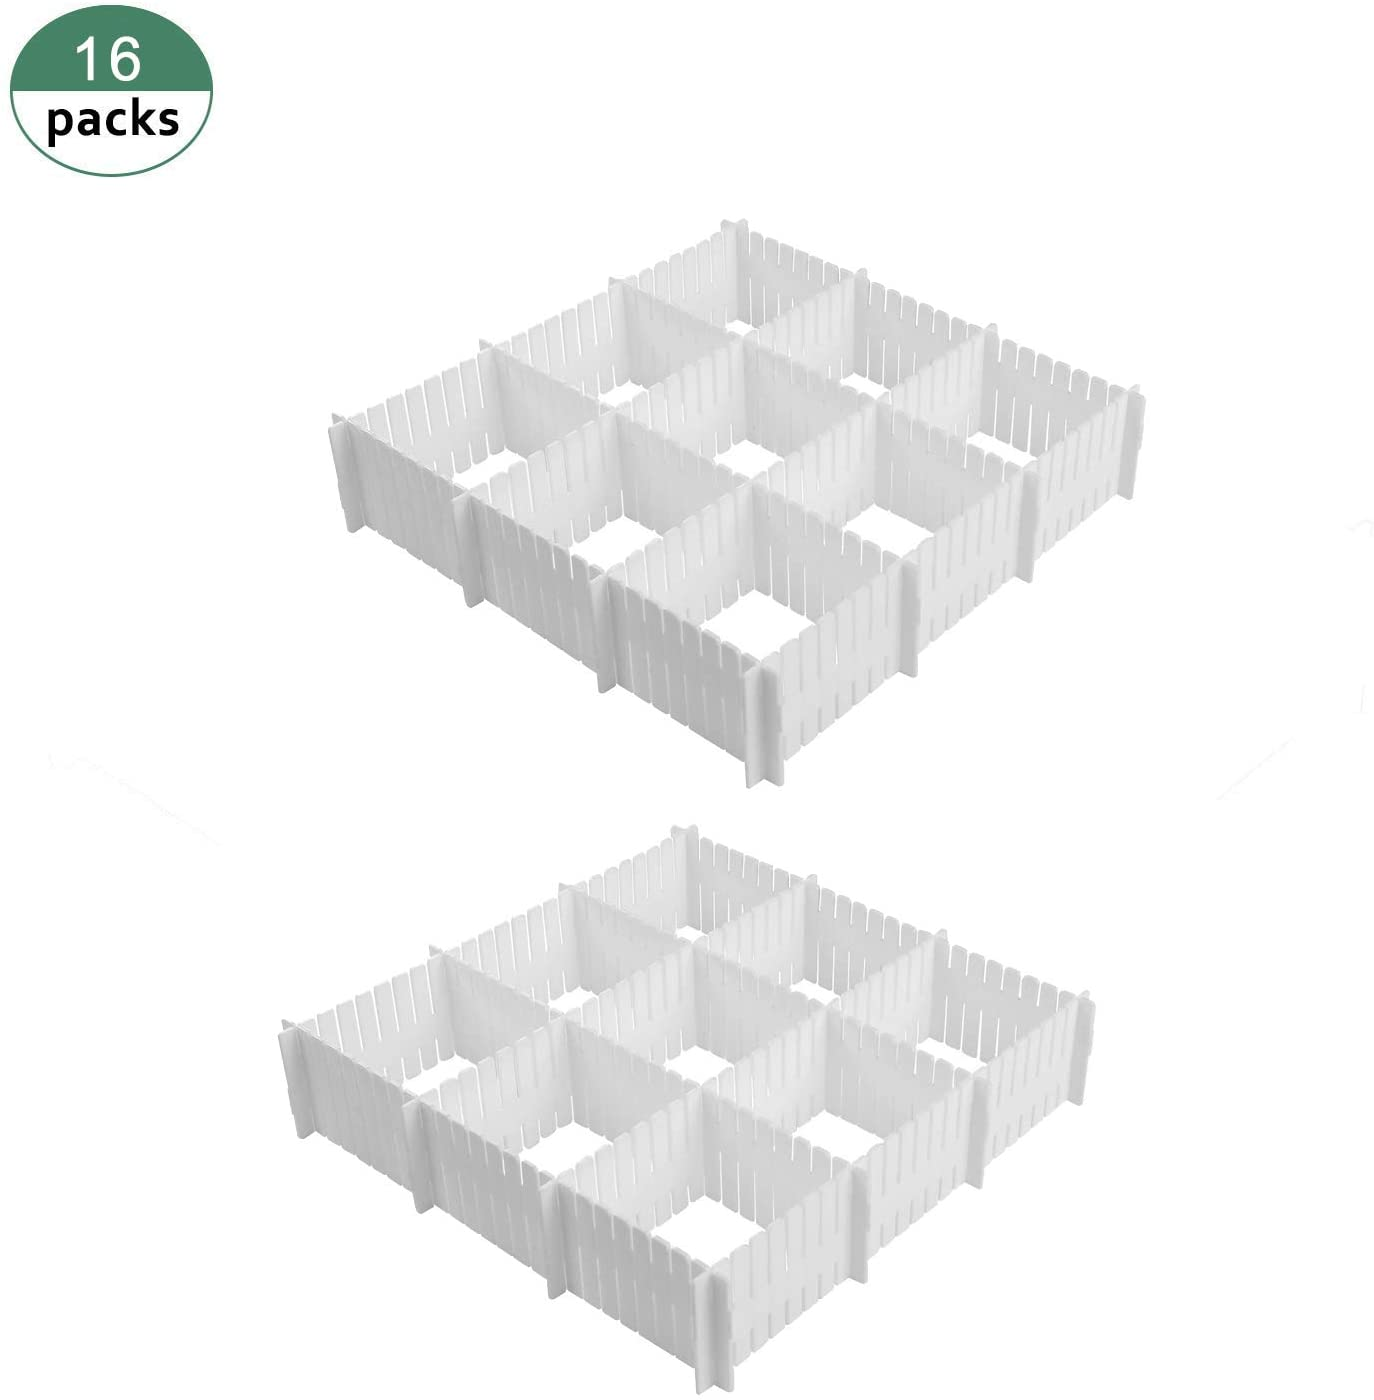 Full Size of Cozywind 16 Stck Schubladenteiler Set Weie Fachteiler Stecksystem Regal Schubladeneinsatz Küche Wohnzimmer Schubladeneinsatz Stecksystem